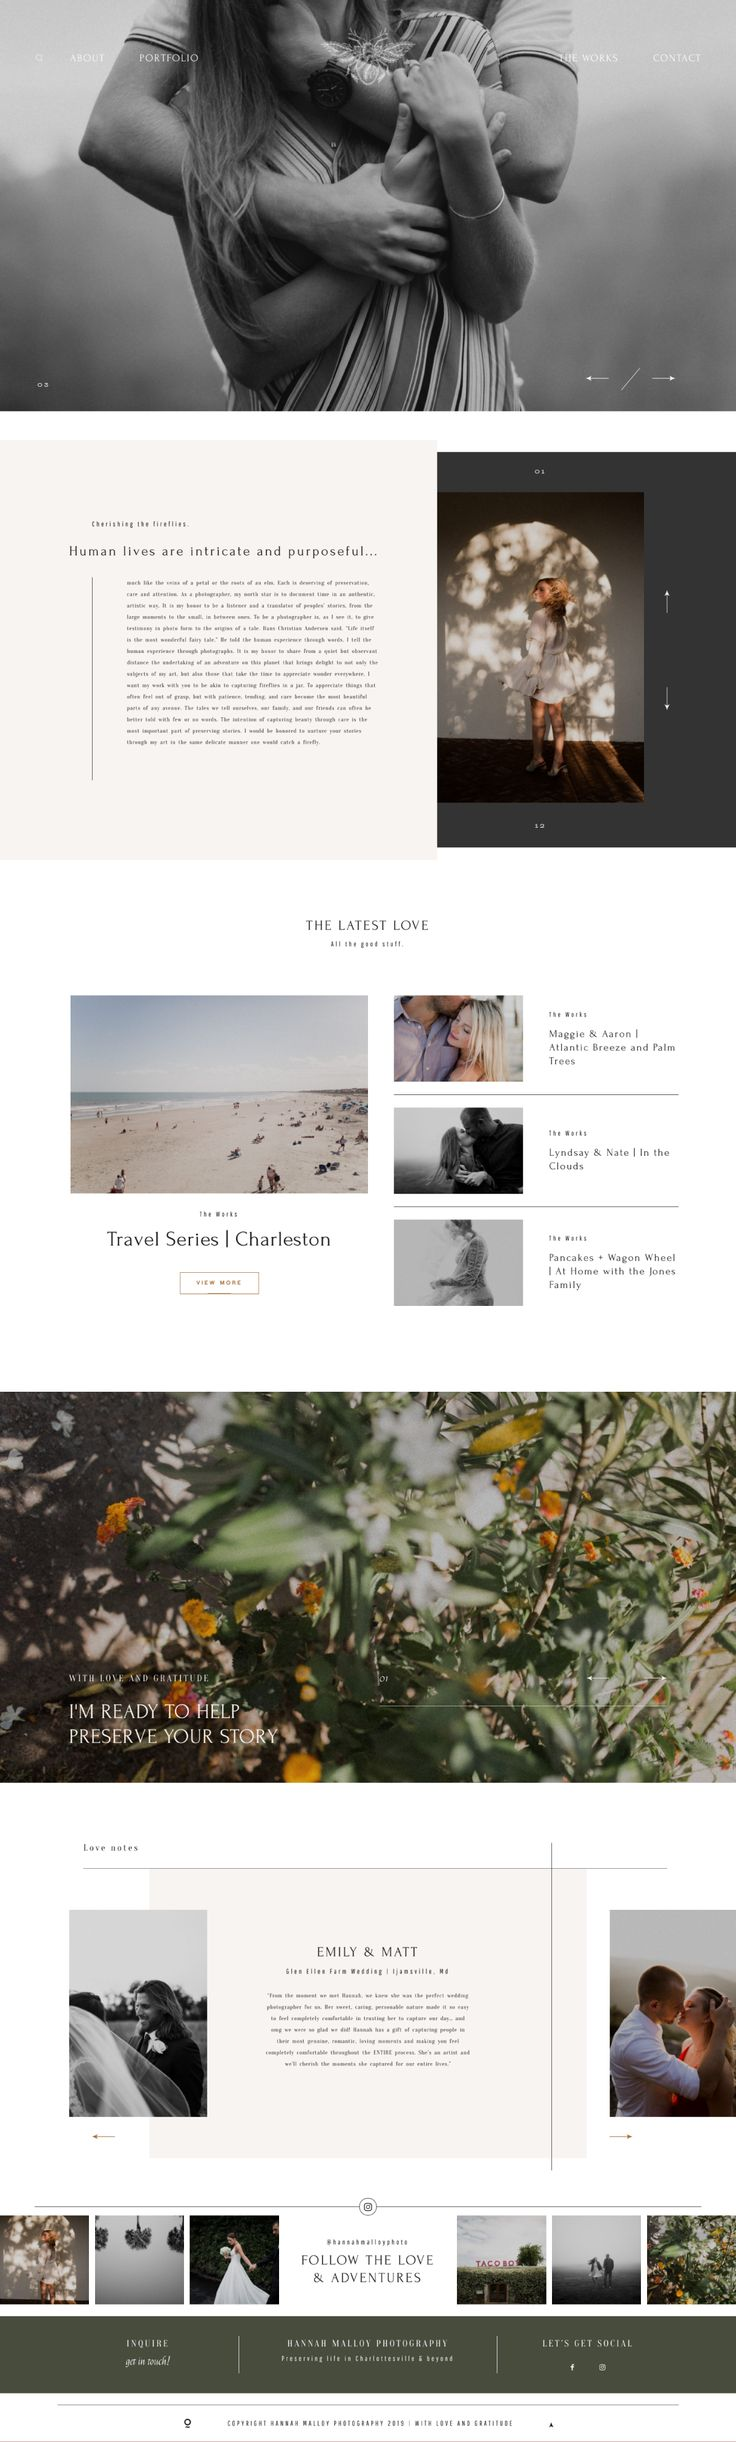 Wedding Photography Website Design – Milea WordPress Theme by Flothemes